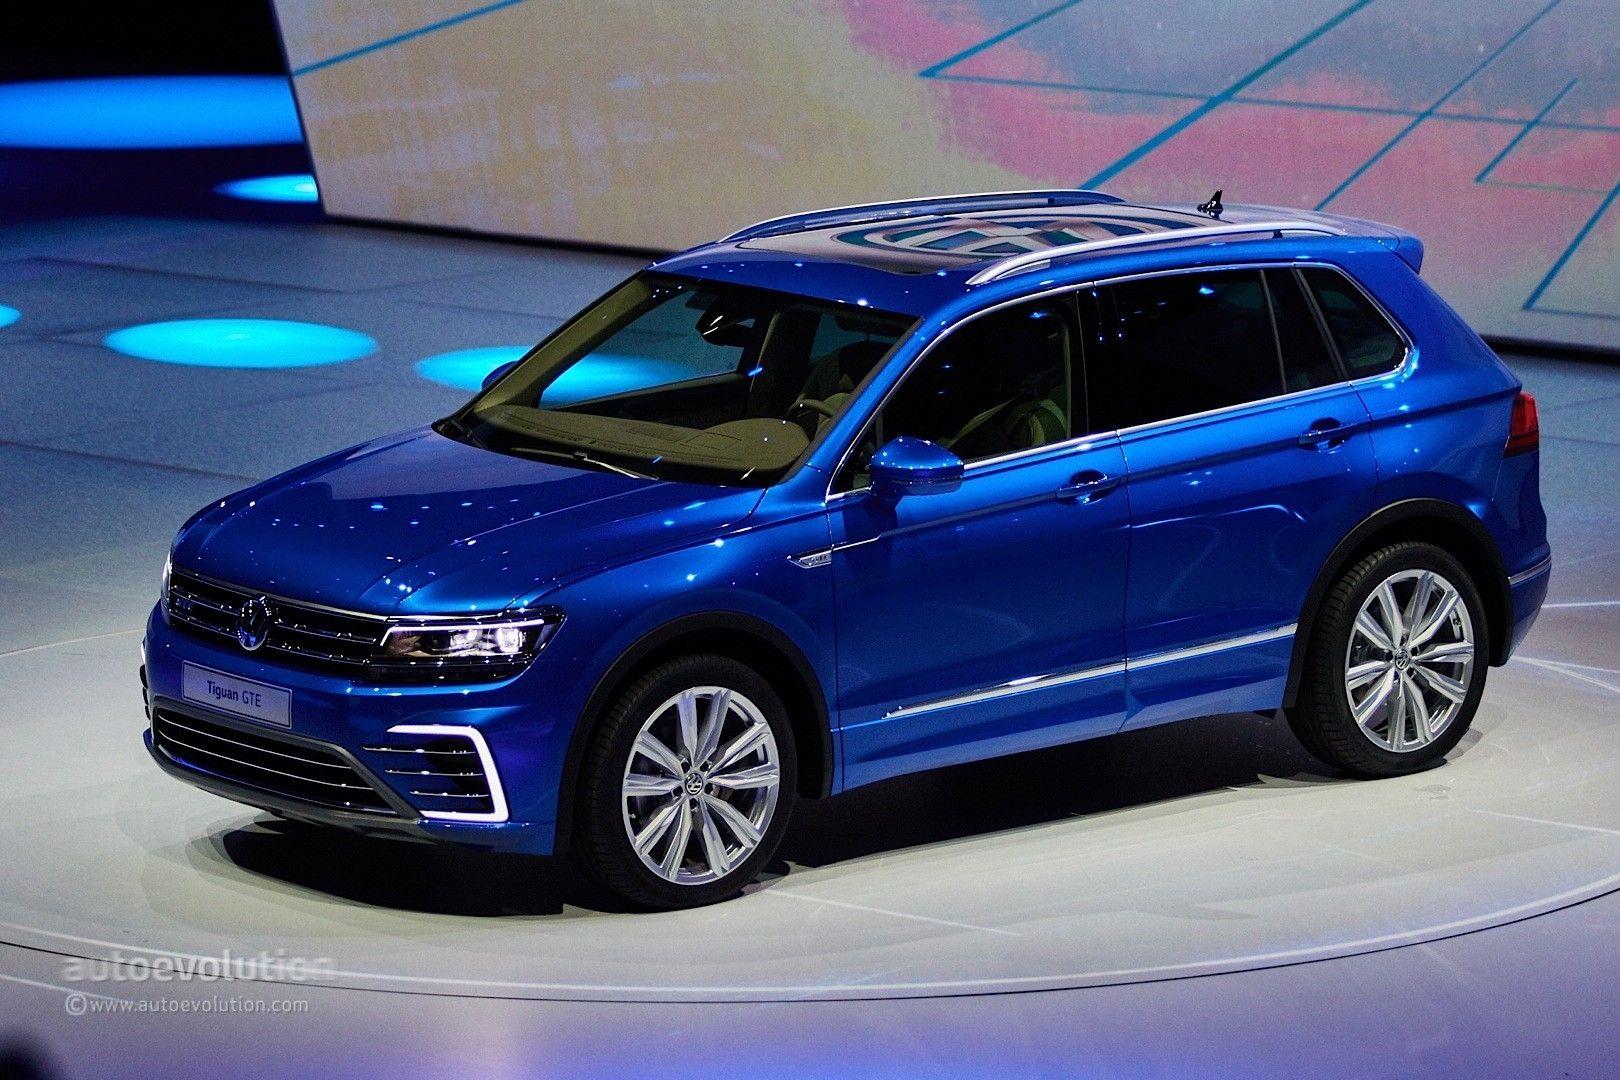 2019 VW Tiguan Interior, Exterior And Review